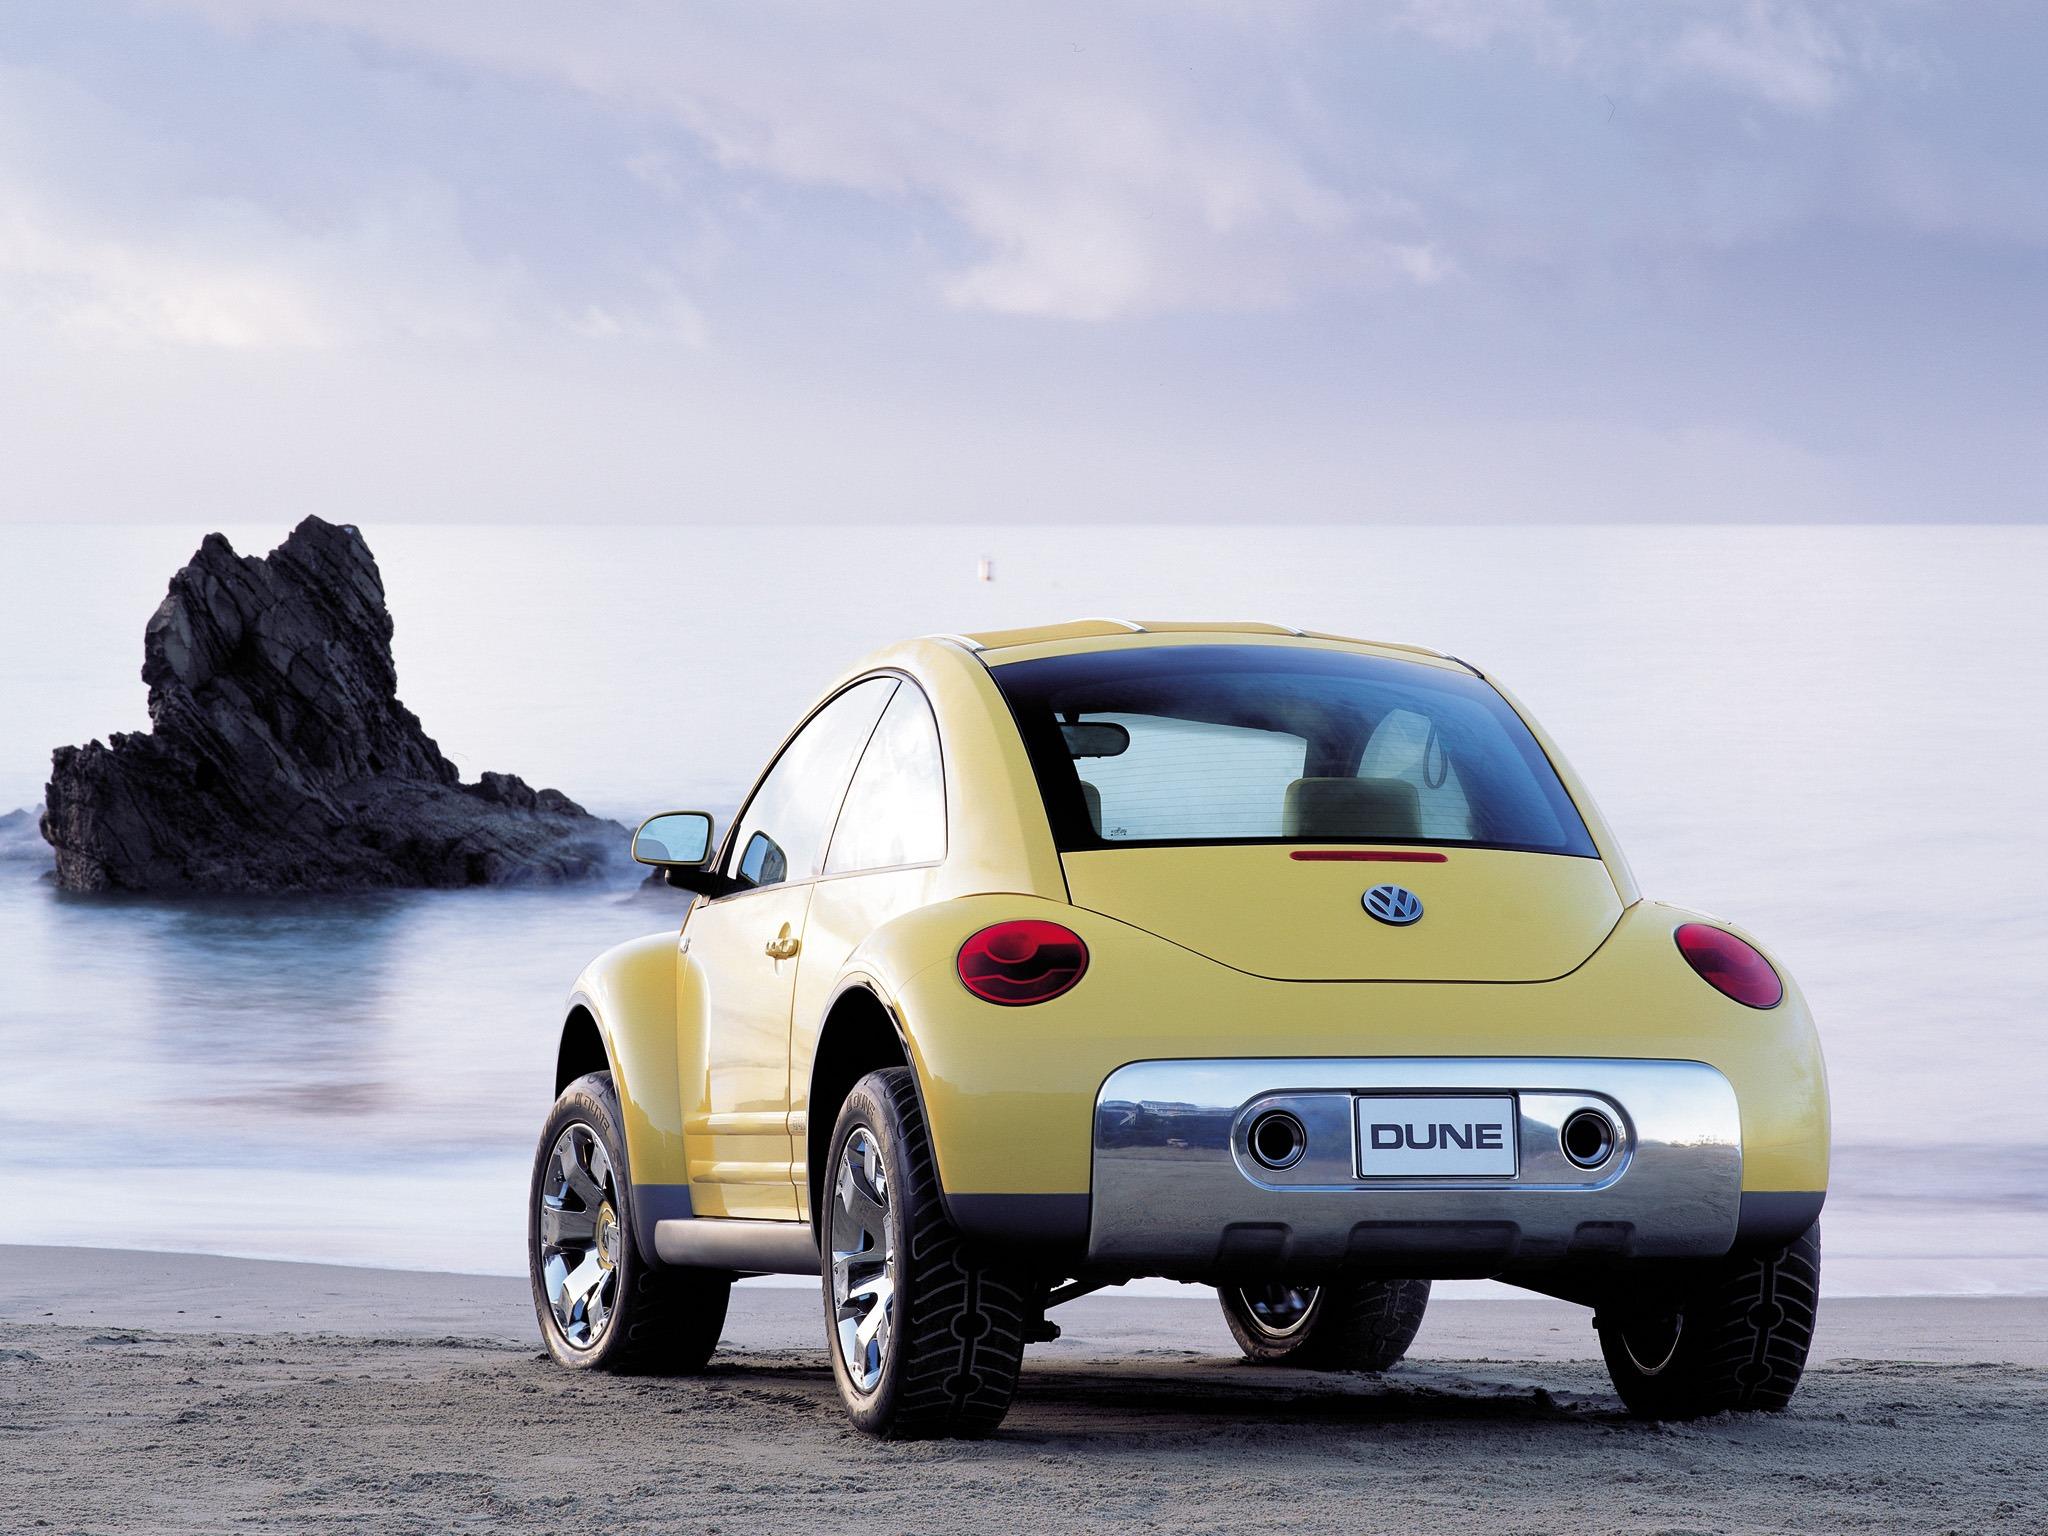 Wallpaper Amazing Convertible Cars Volkswagen New Beetle Dune Concept Old Concept Cars